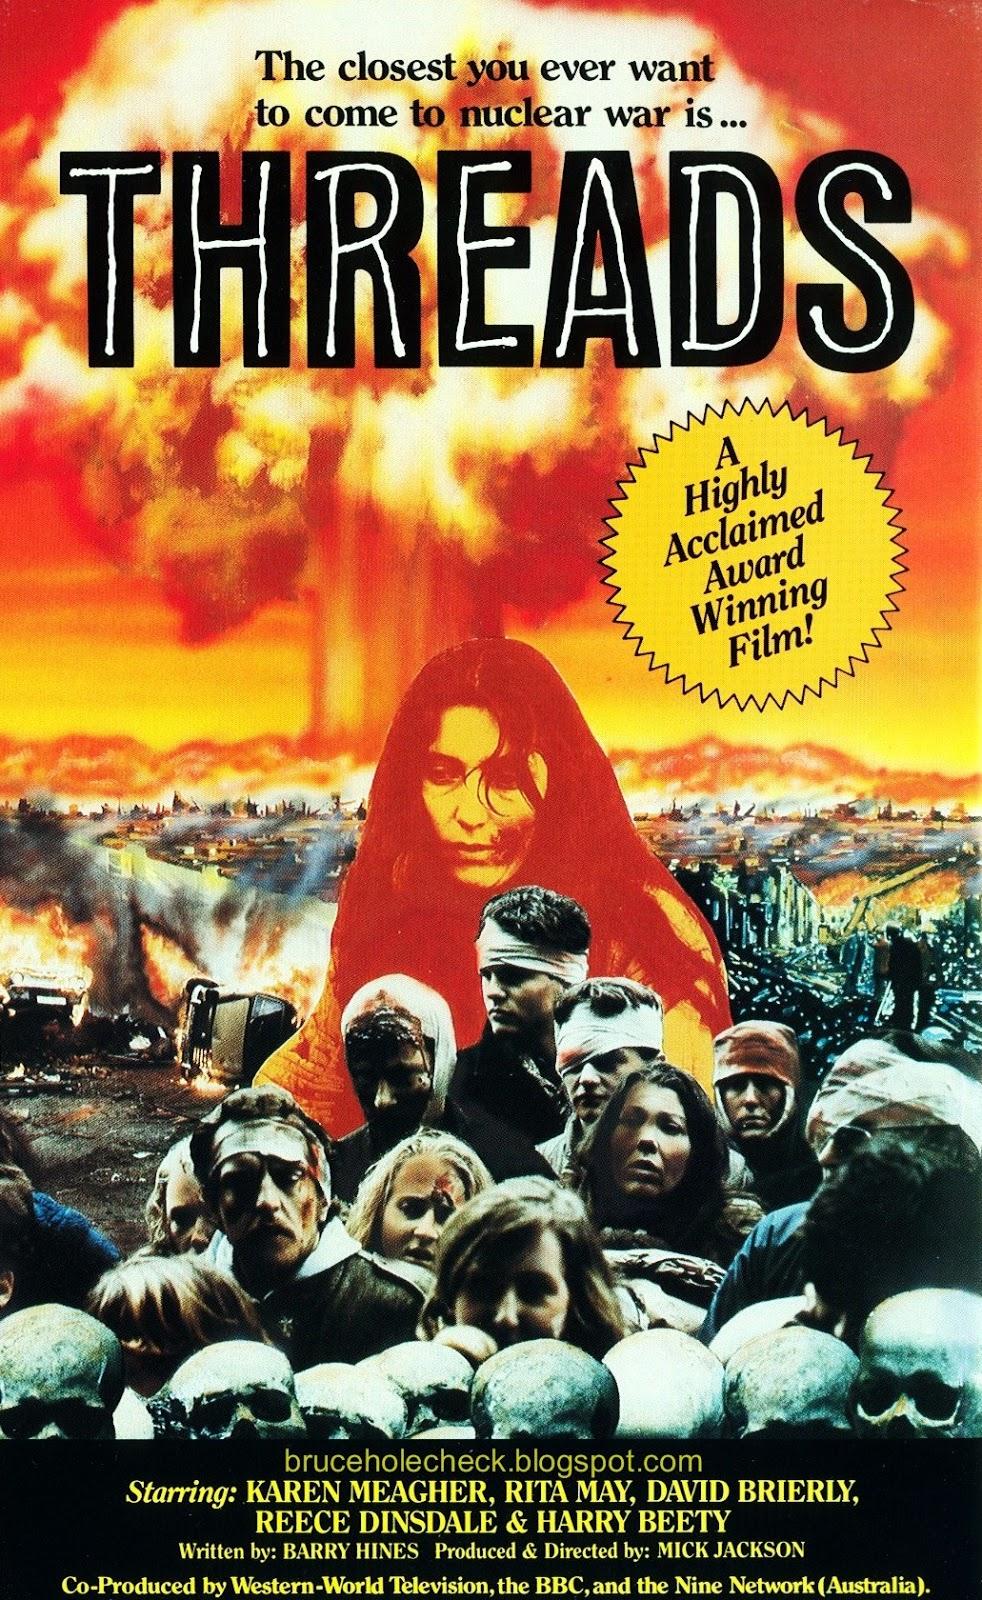 Threads+US+World+Video+VHS+Front.jpg